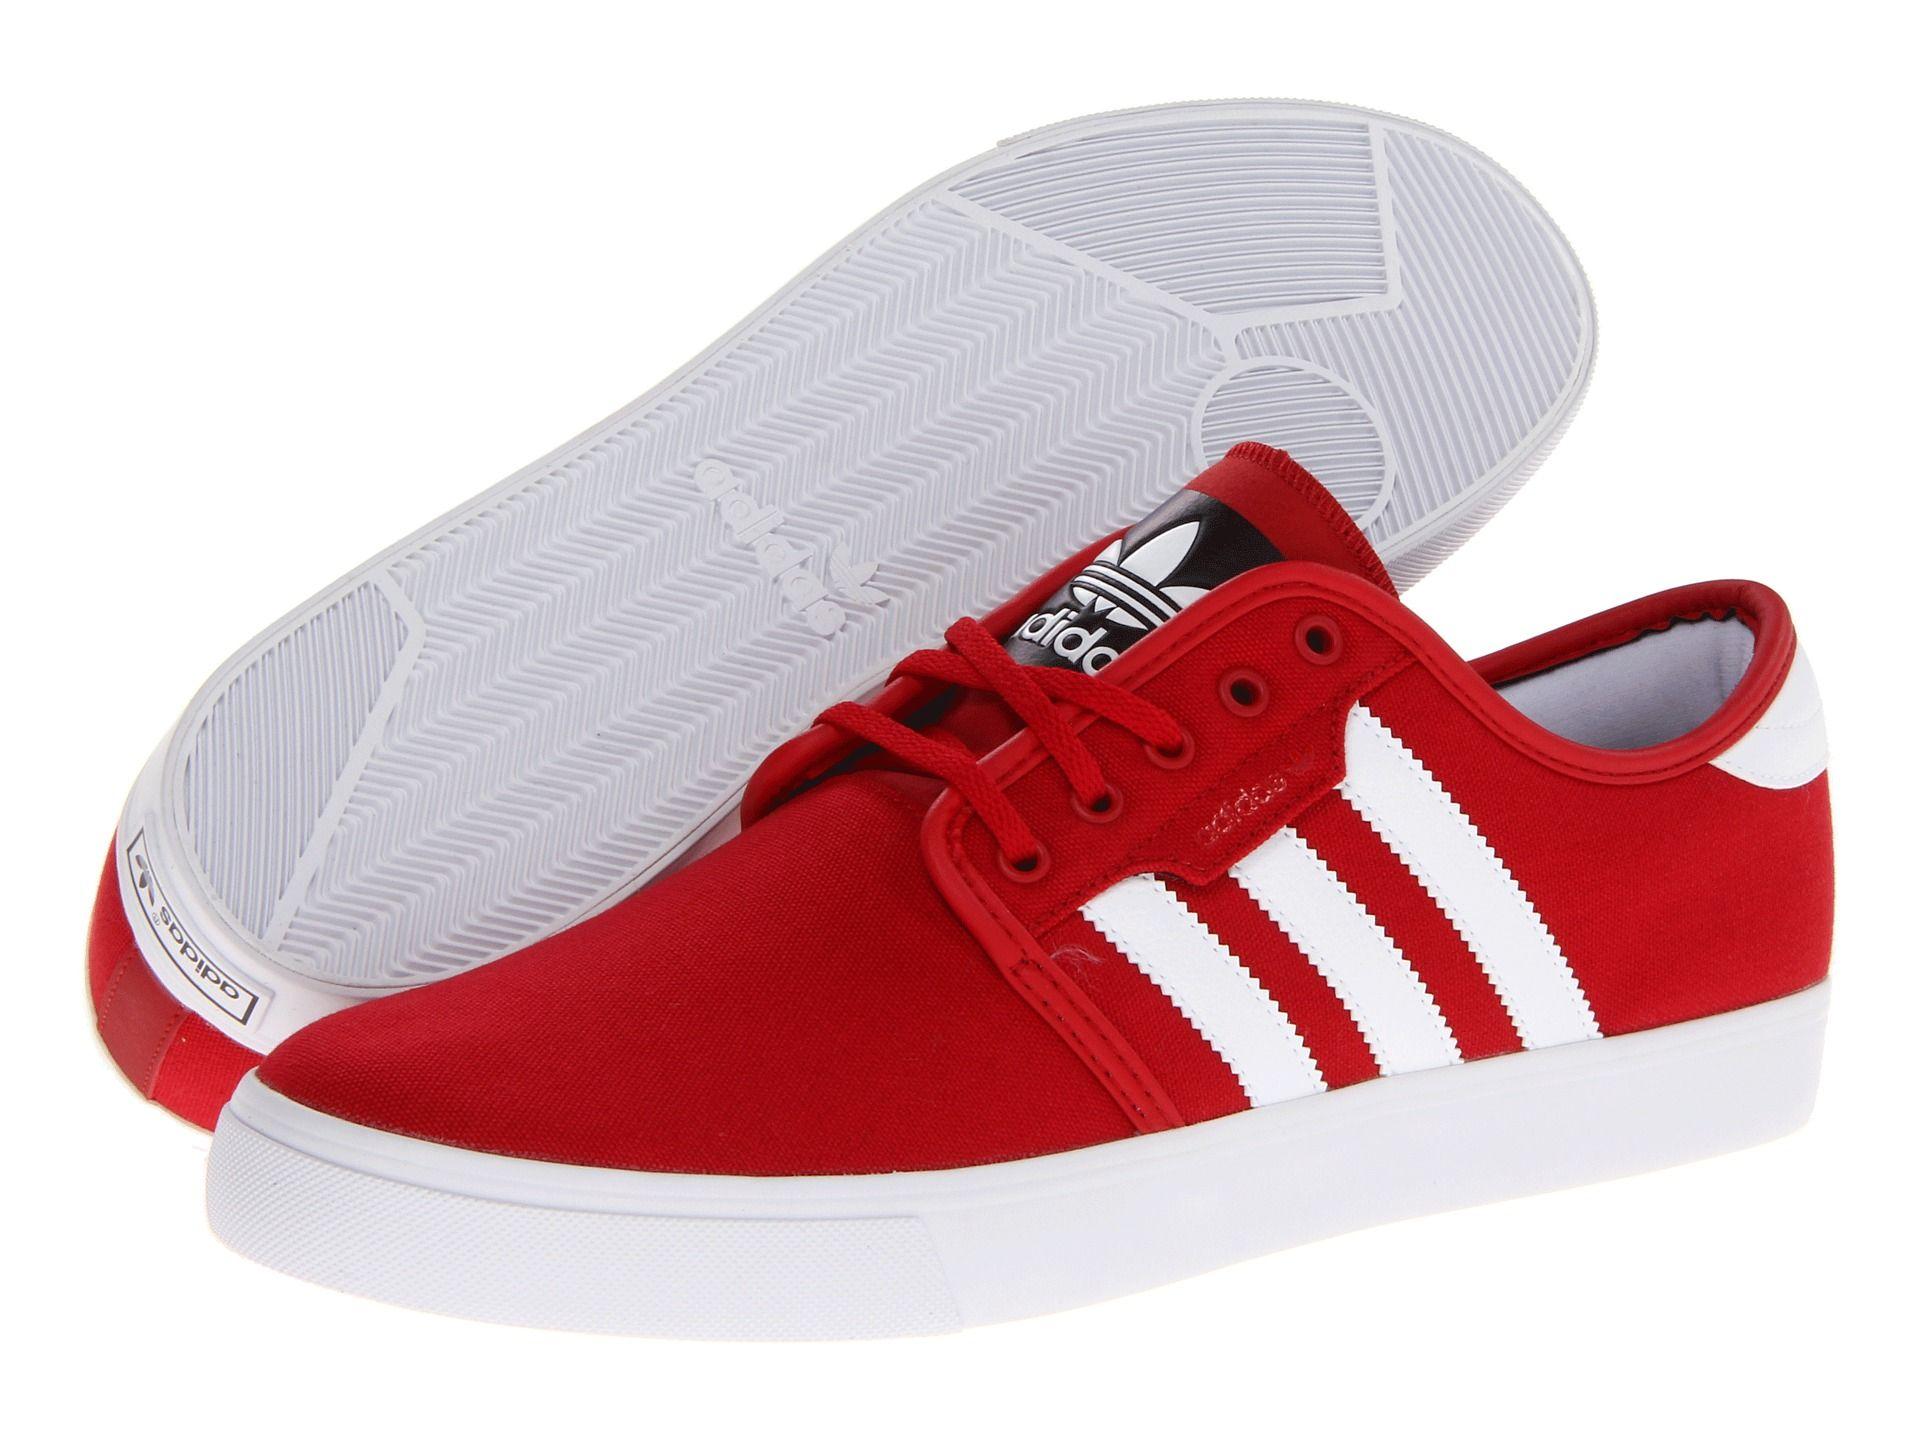 Seeley Adidas Men Shoes RedShoes Skateboarding 34S5cRjqLA